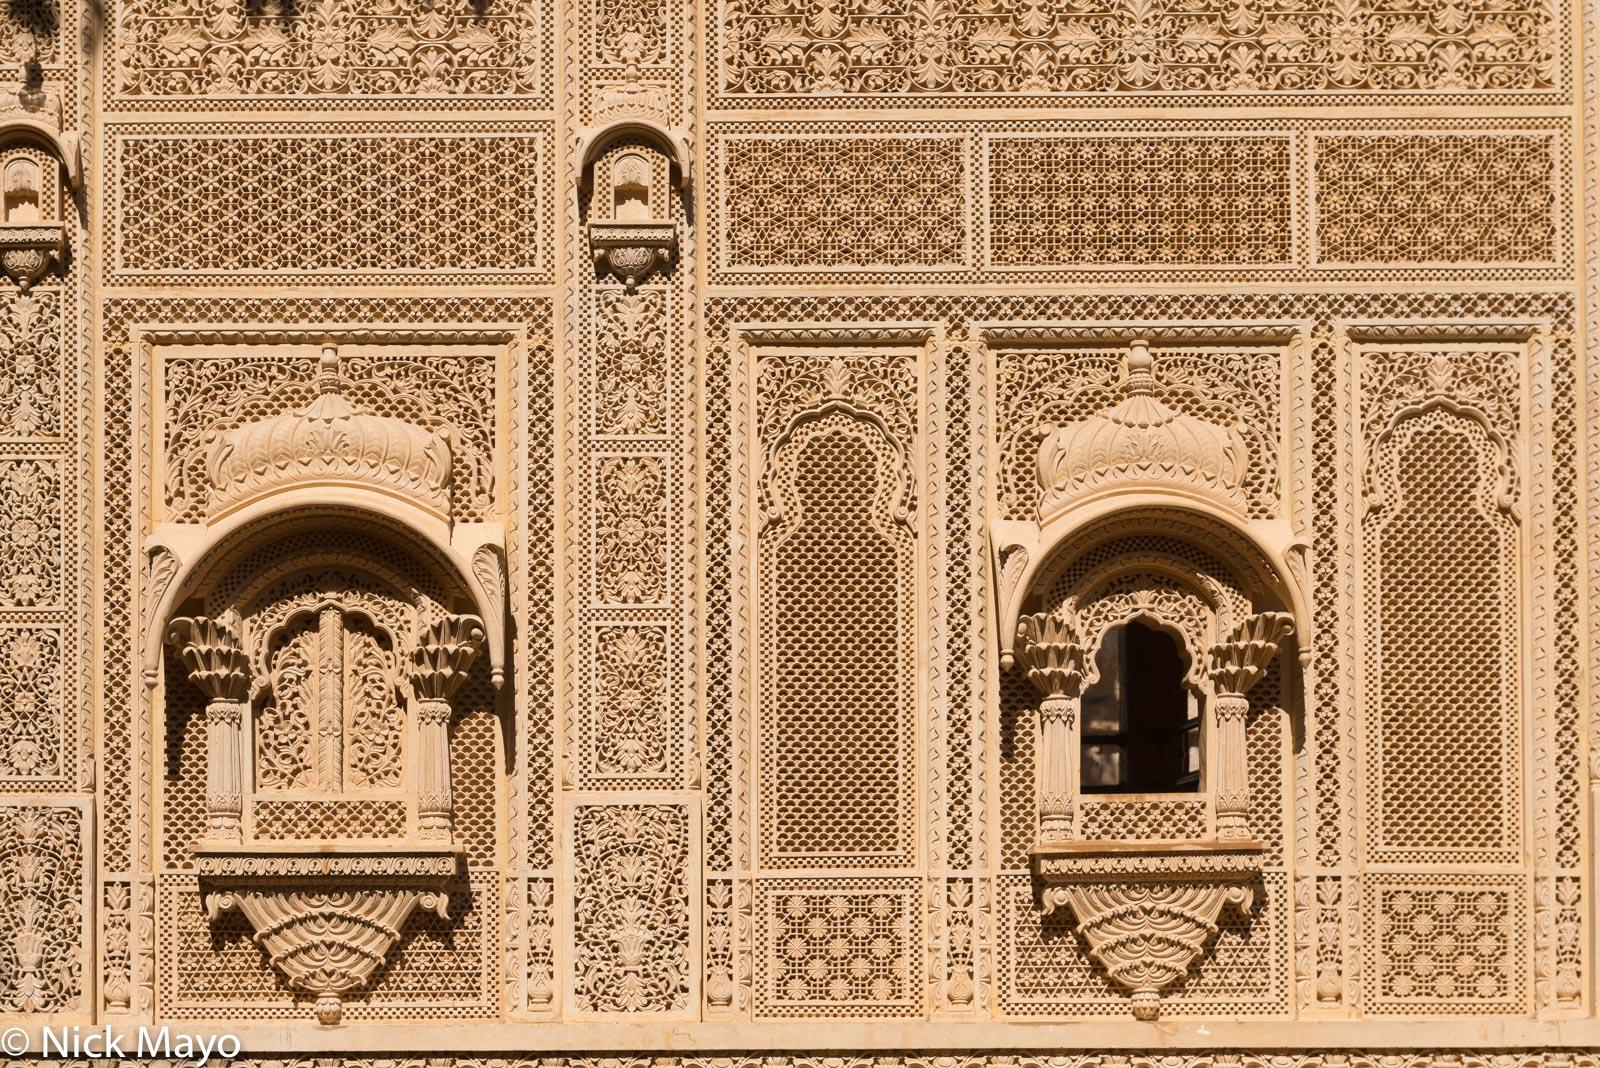 India, Rajasthan, Temple, Wall, Window, photo